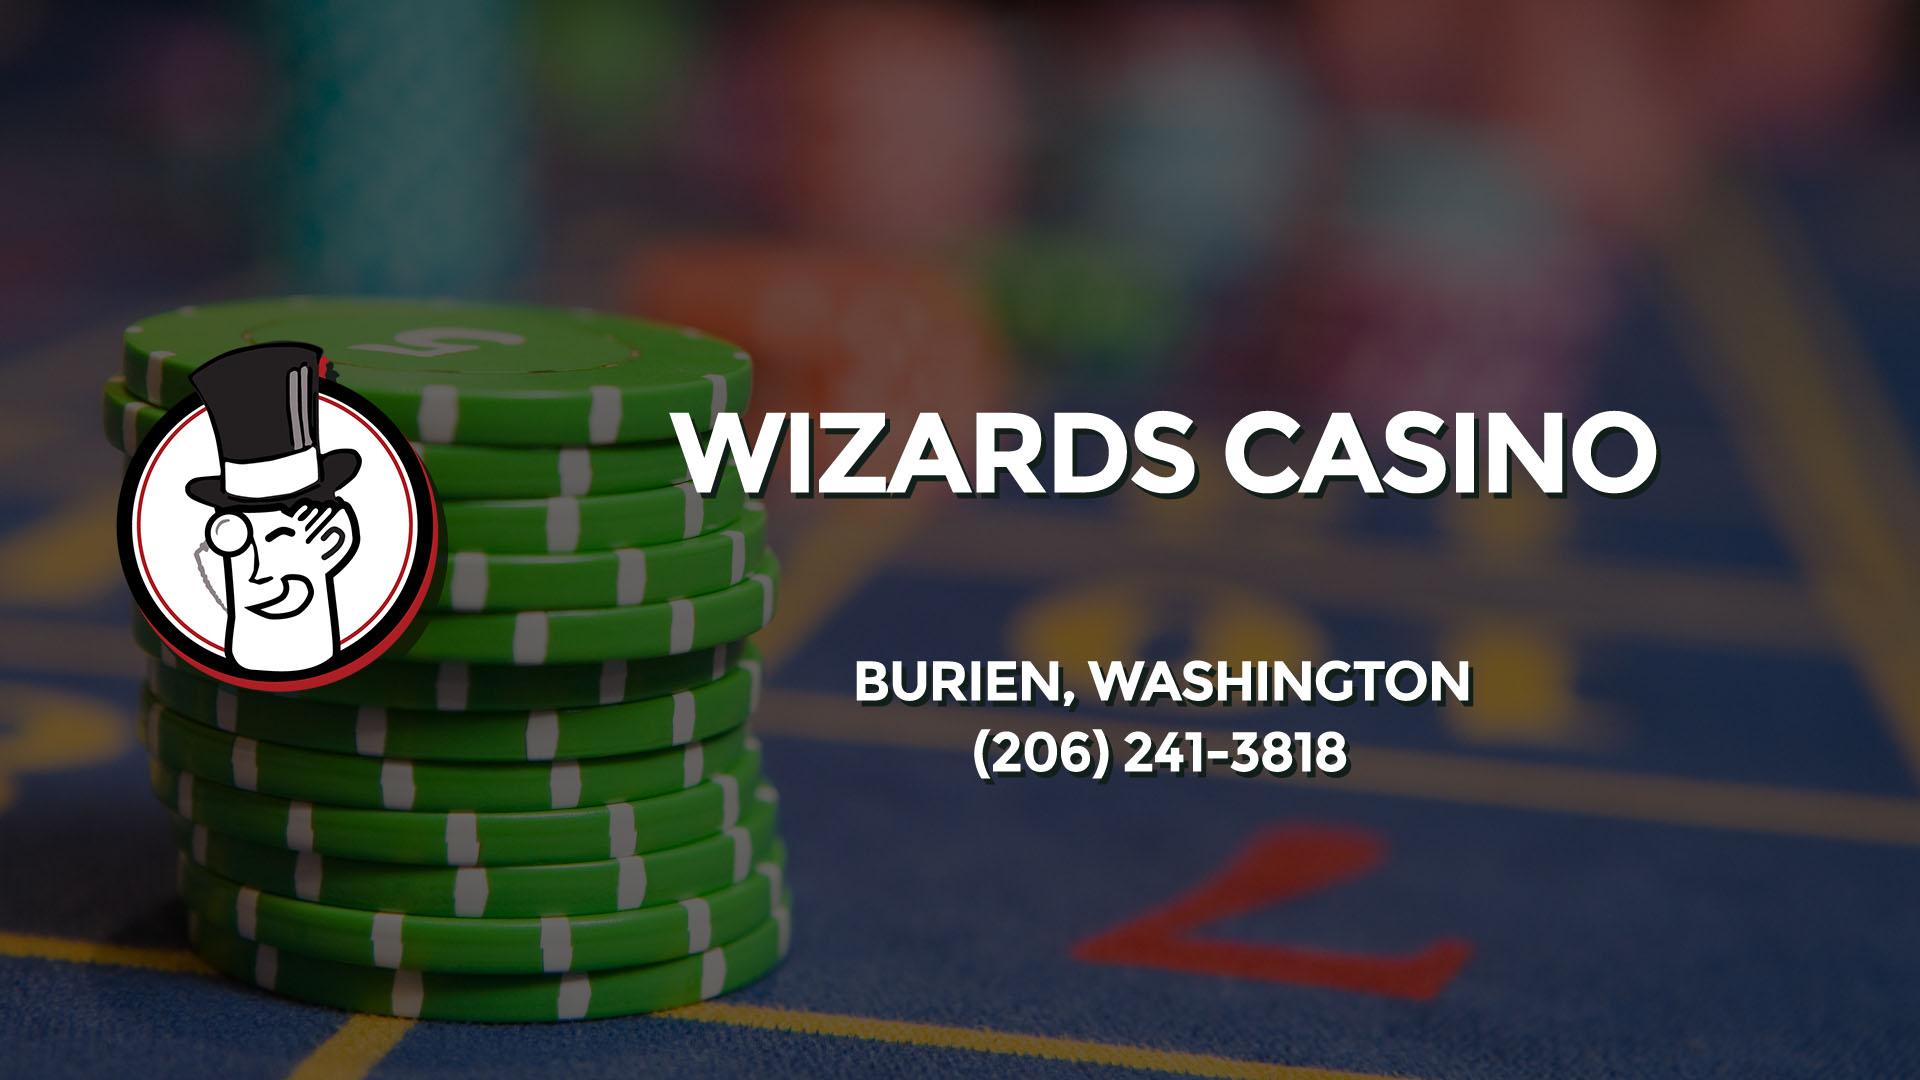 Wizards casino